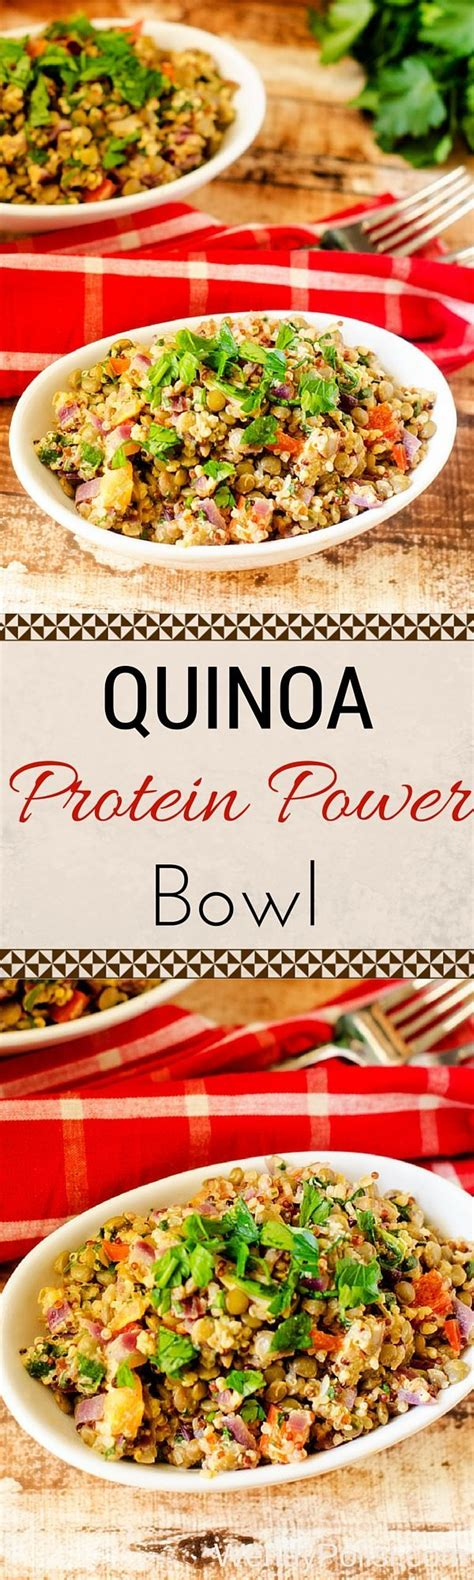 protein in quinoa best 25 quinoa protein ideas on quinoa fried